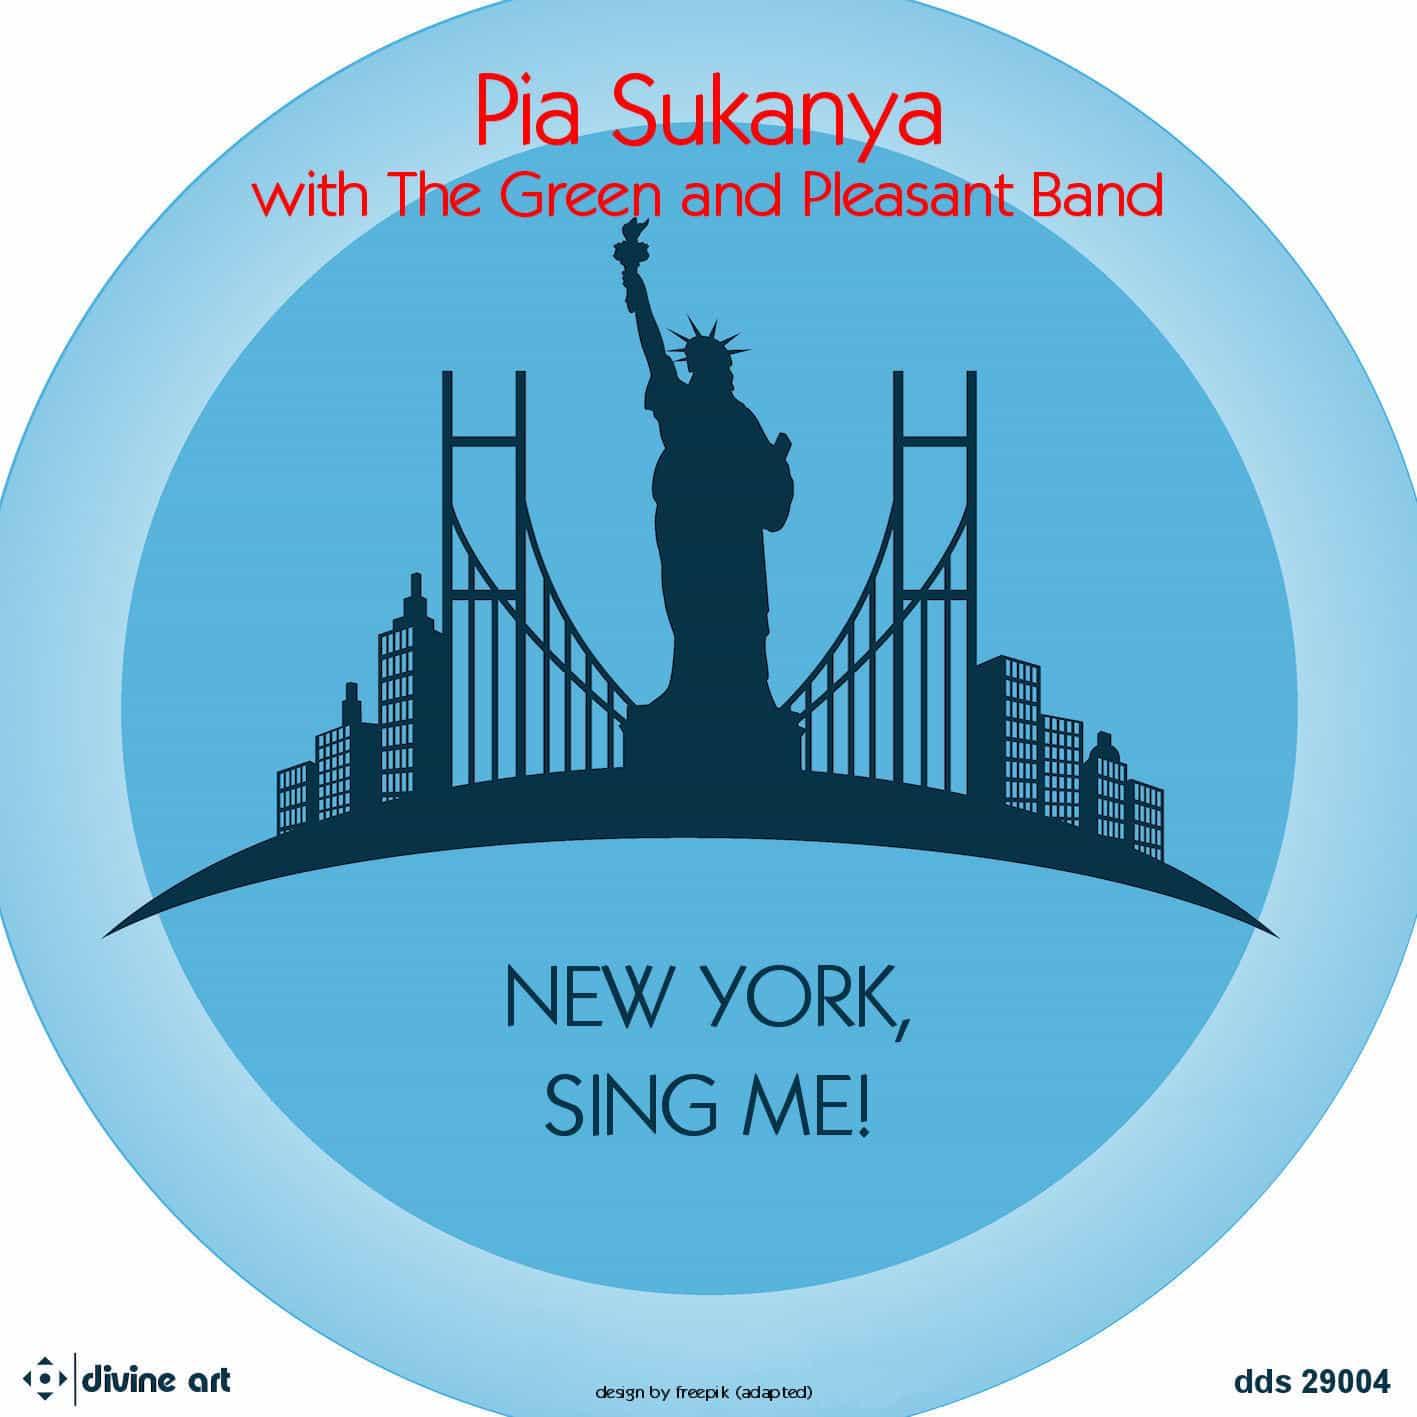 Henderson: New York, Sing Me!